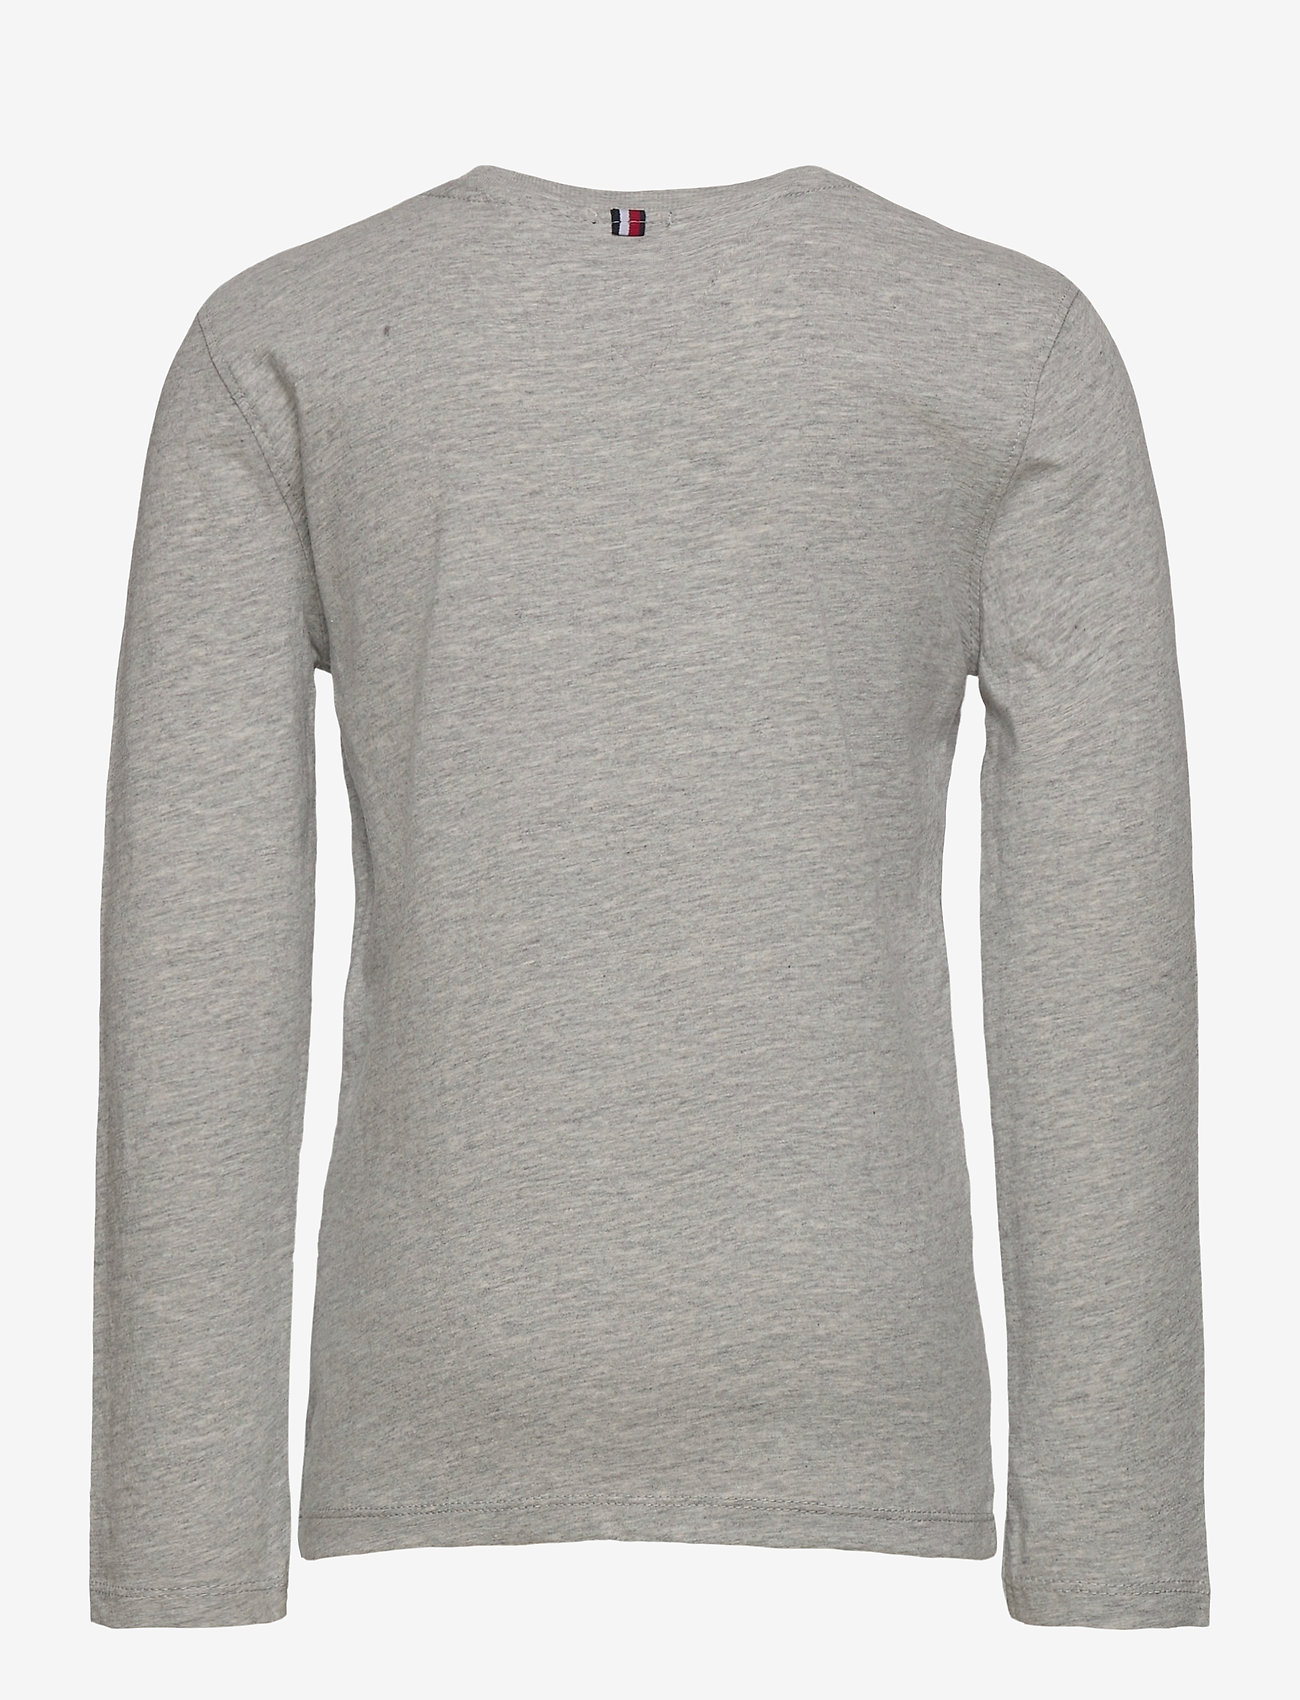 Tommy Hilfiger - BOYS BASIC CN KNIT L - long-sleeved t-shirts - grey heather - 1